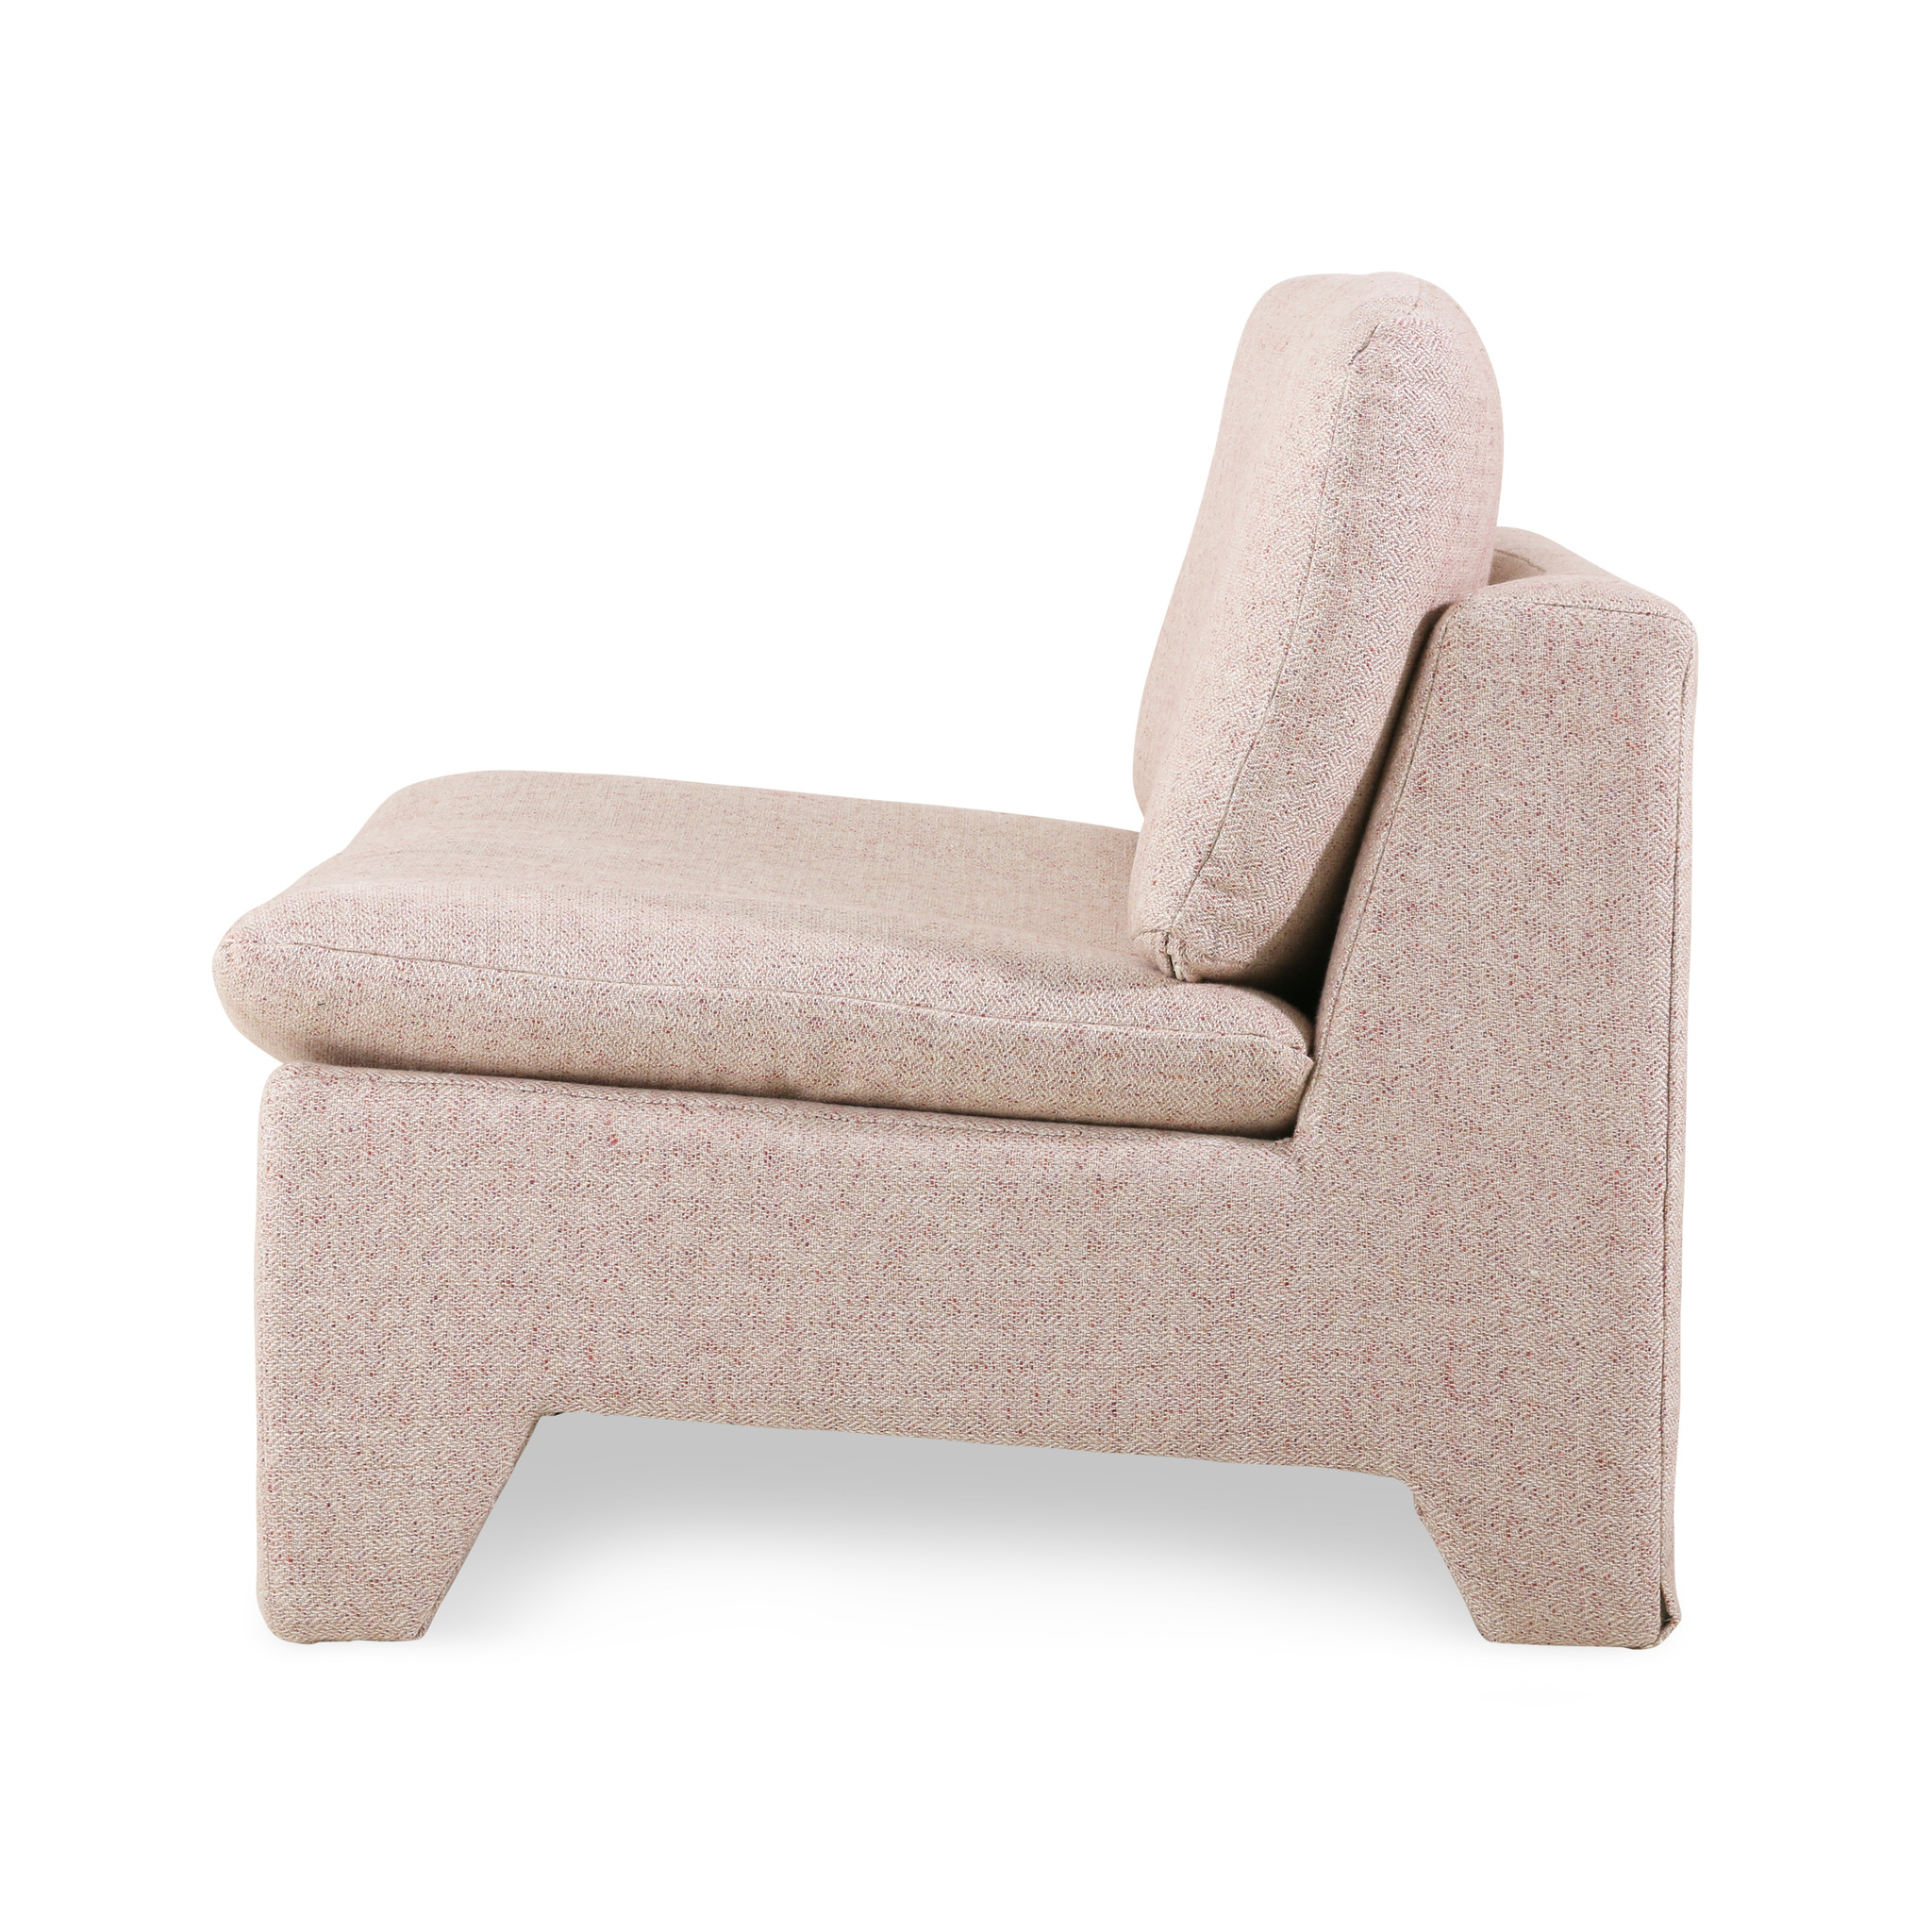 HK Living Retro lounge fauteuil - nude melange